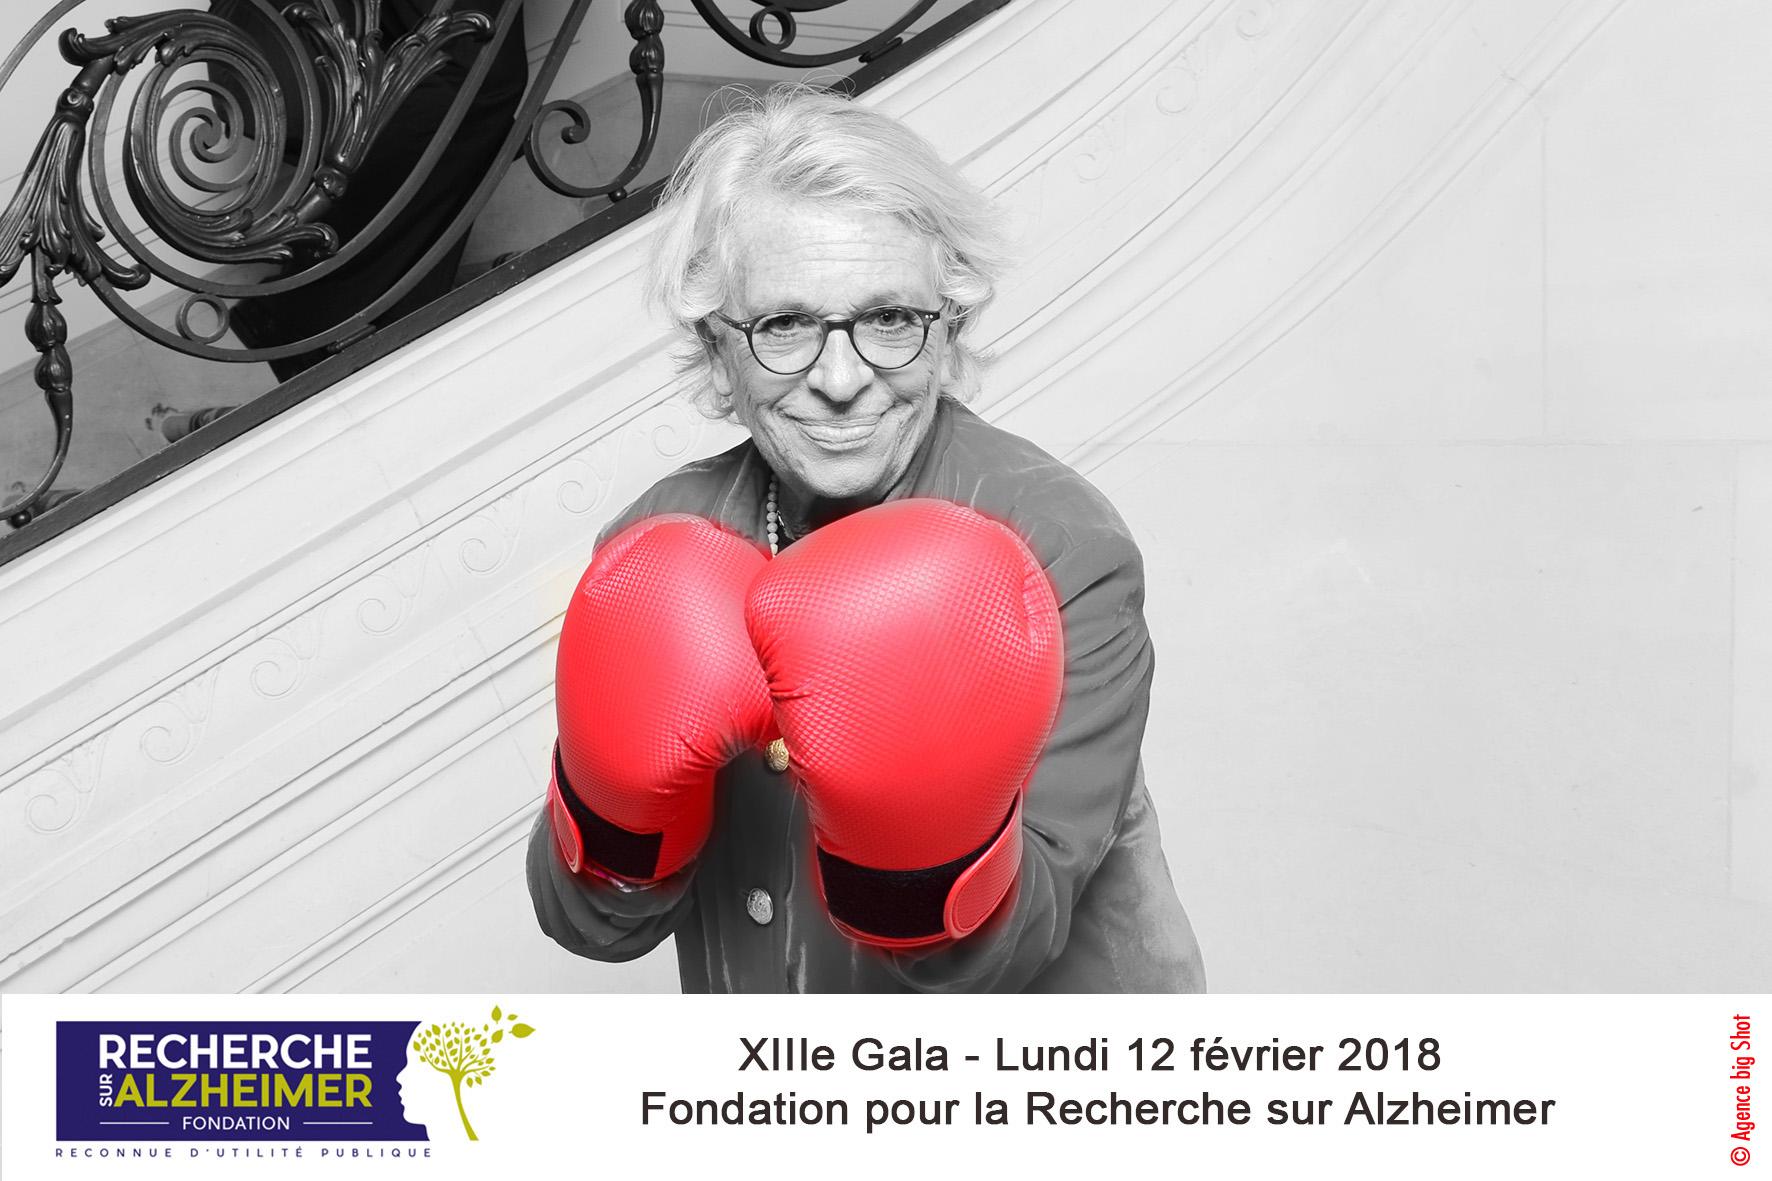 Photocall_retro_Gala_Fondation_Recherche_Alzheimer